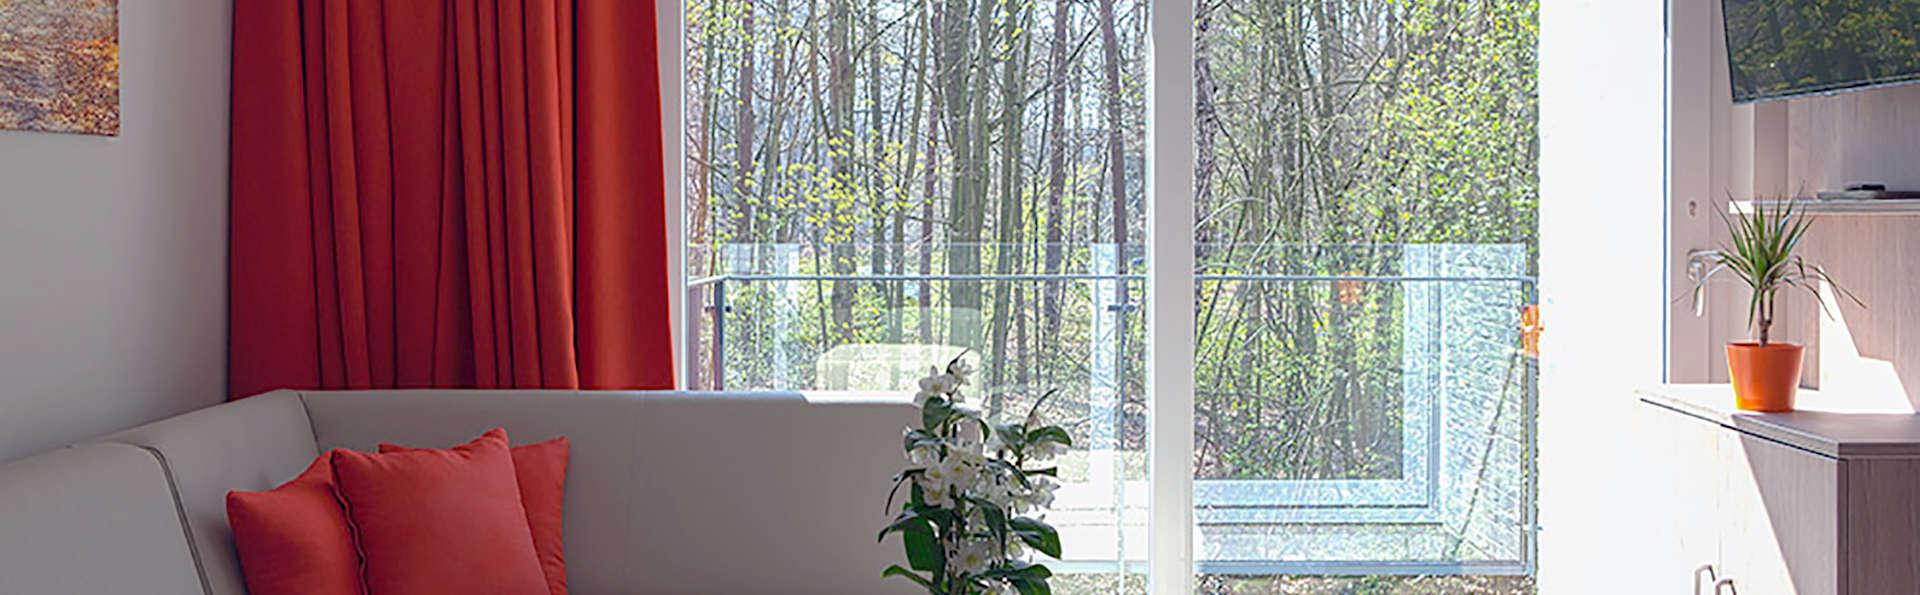 Holiday Suites Houthalen Helchteren - Edit_apartment1.jpg